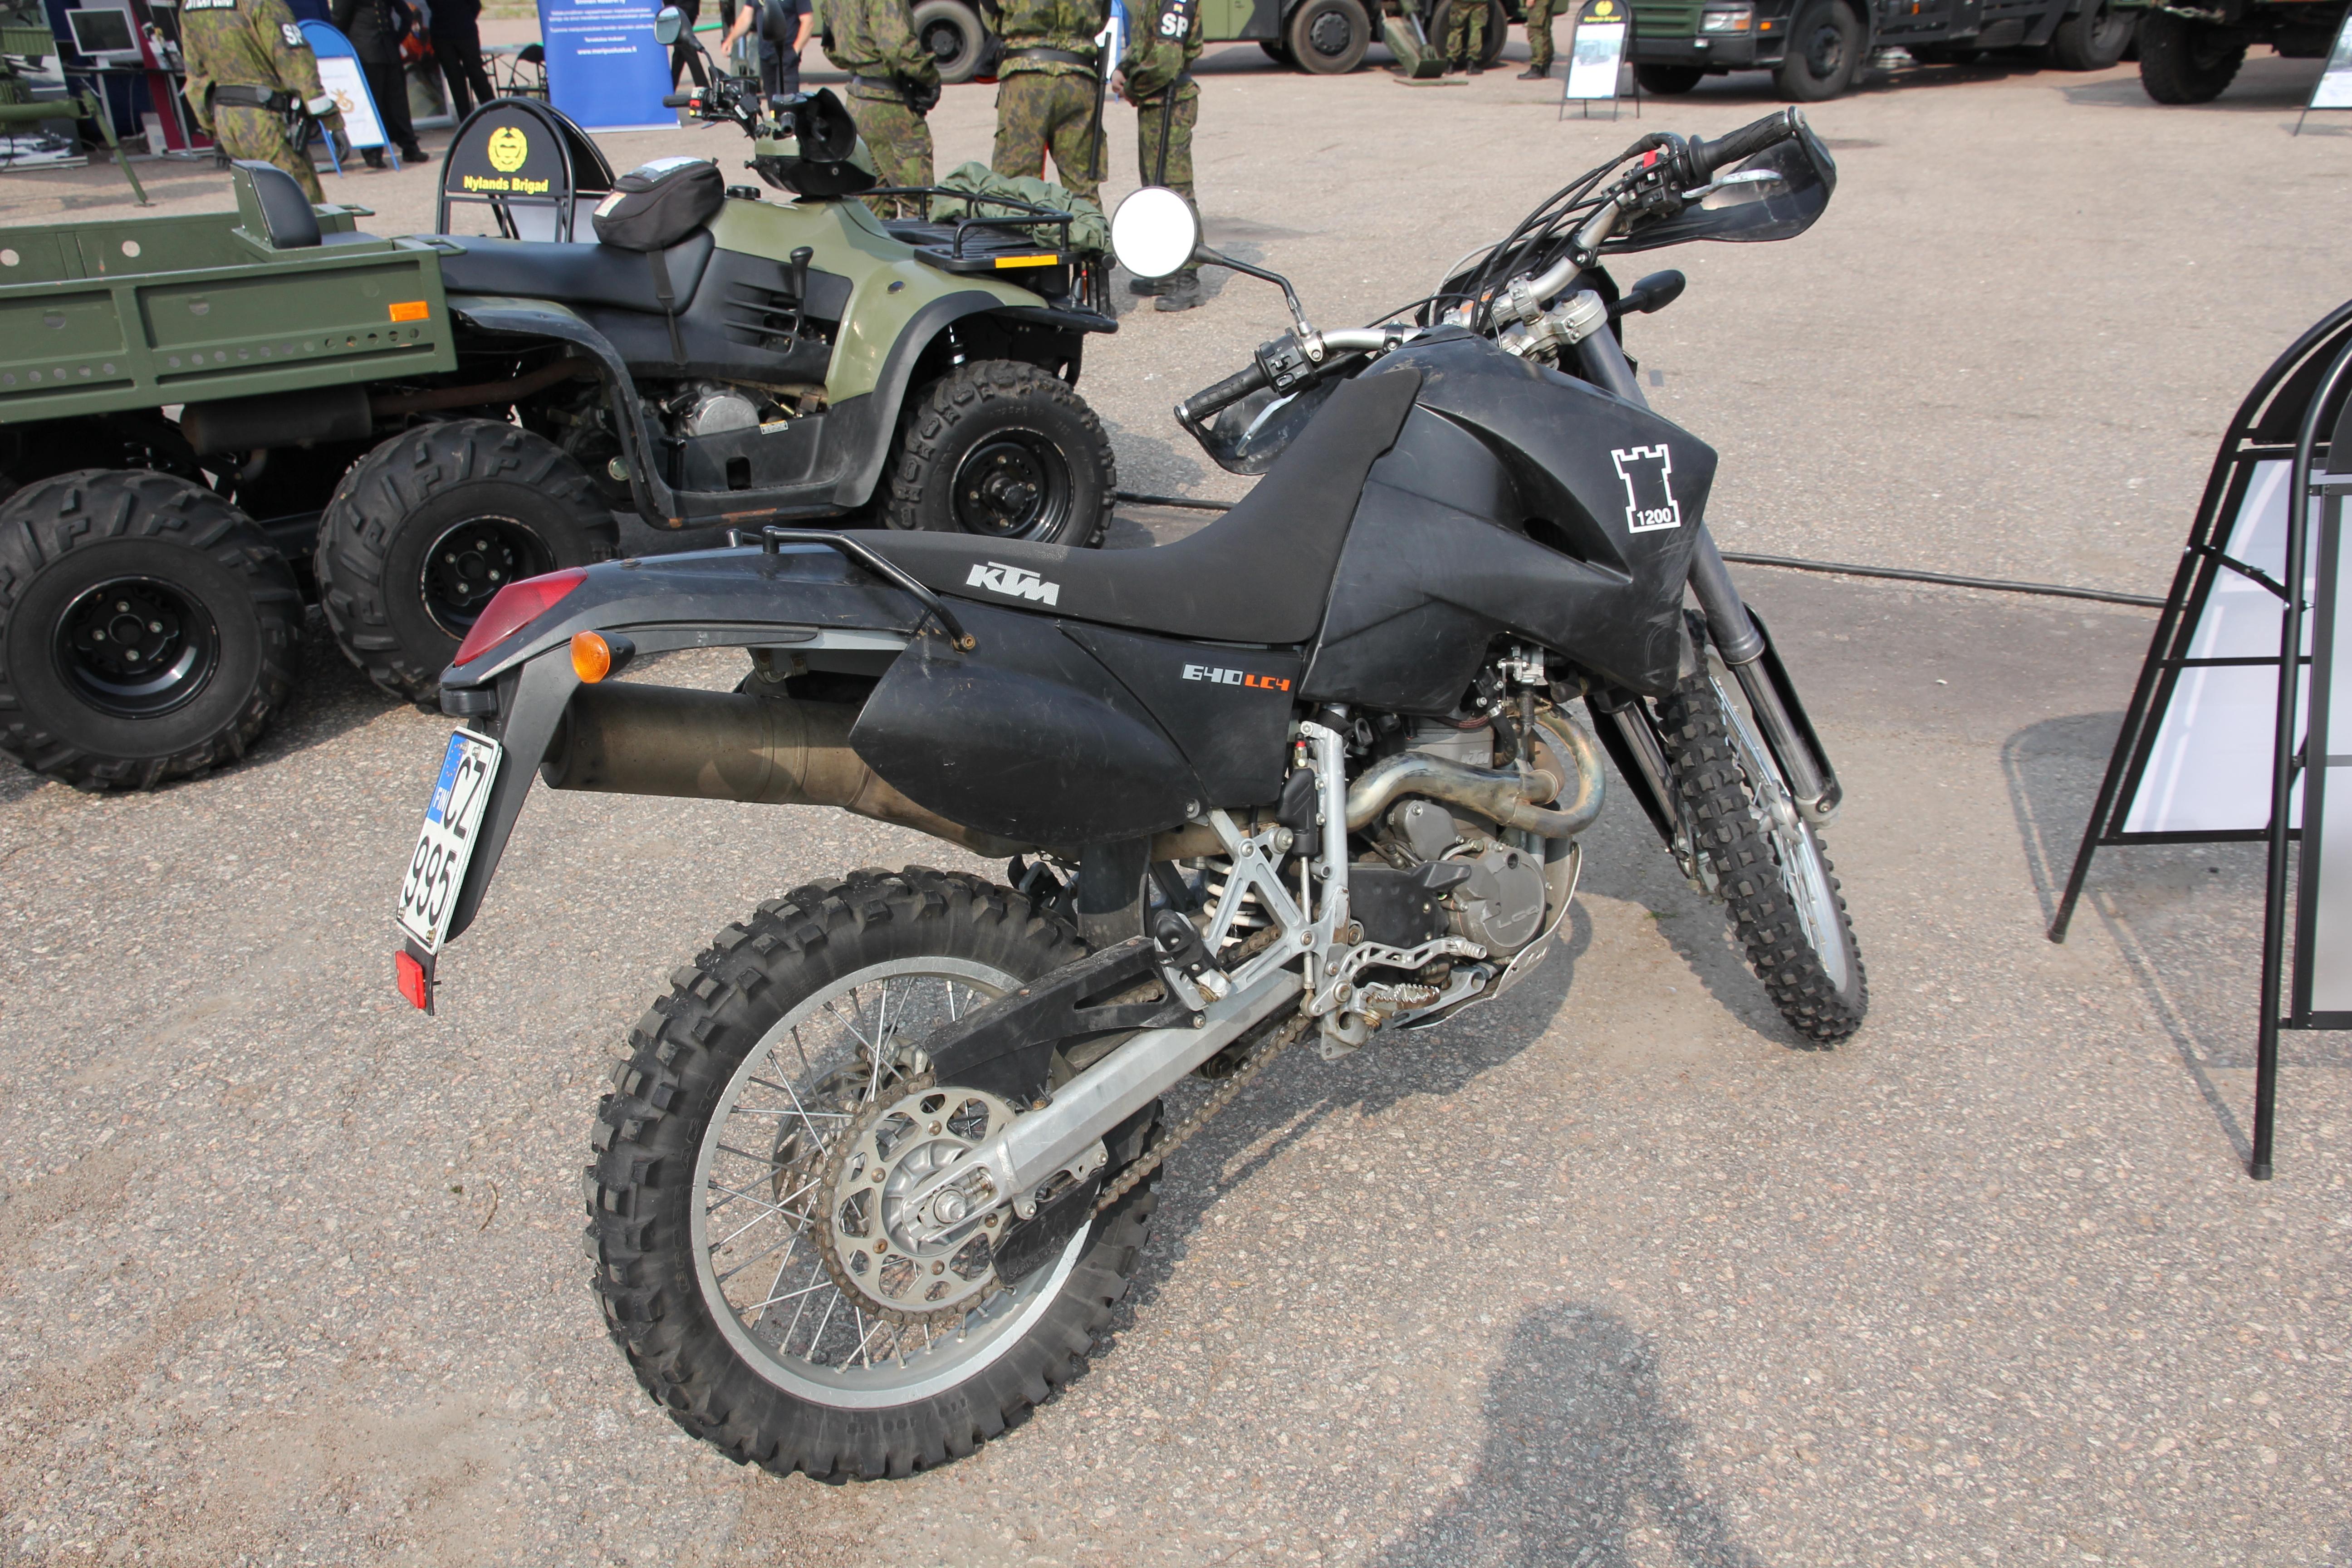 File:KTM 640 LC4 Enduro Kotka 2013.JPG - Wikimedia Commons